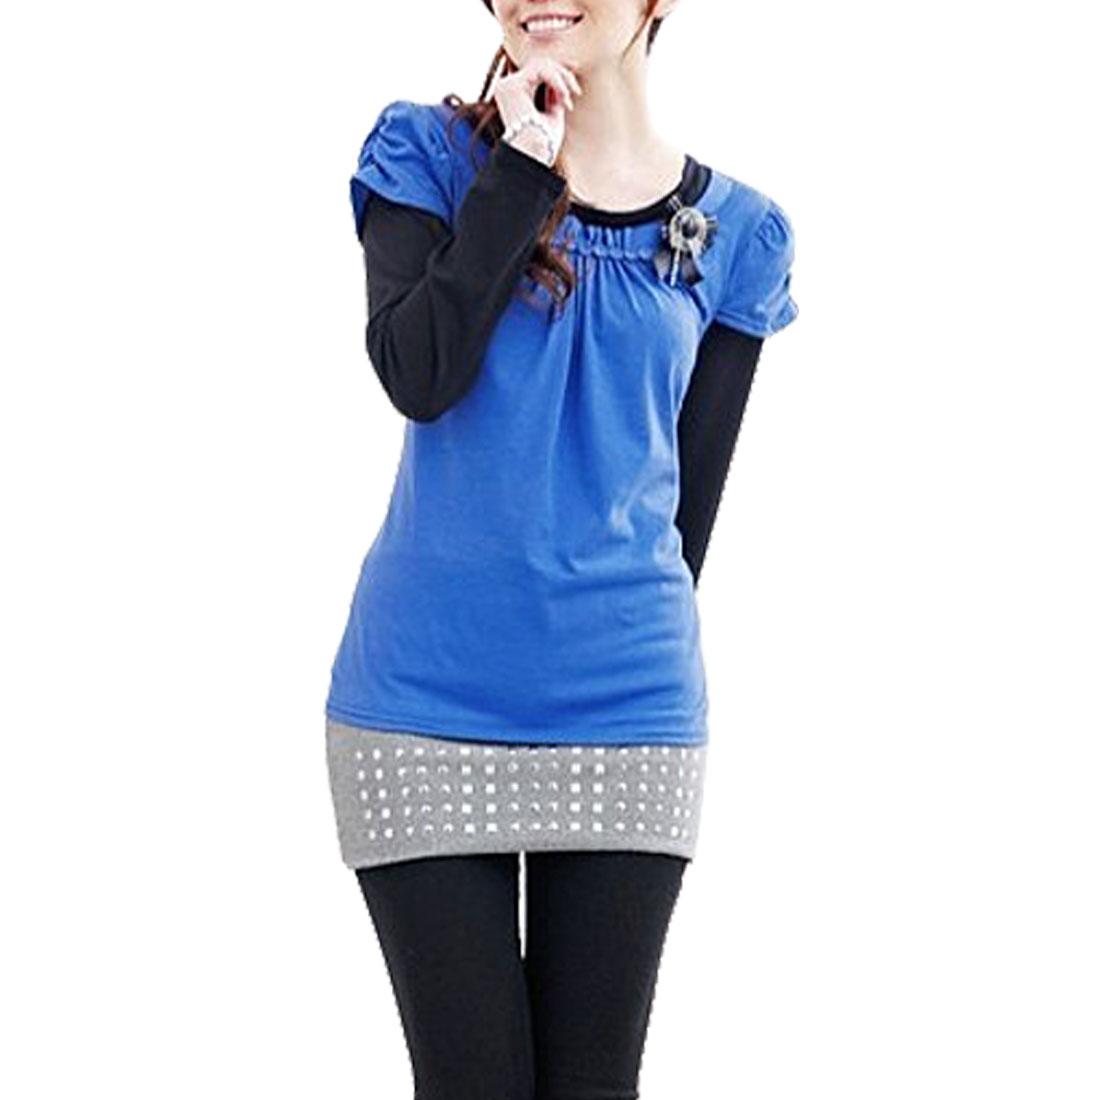 Autumn Blue Black Scoop Neck Layered Shirts Shirt XS for Women